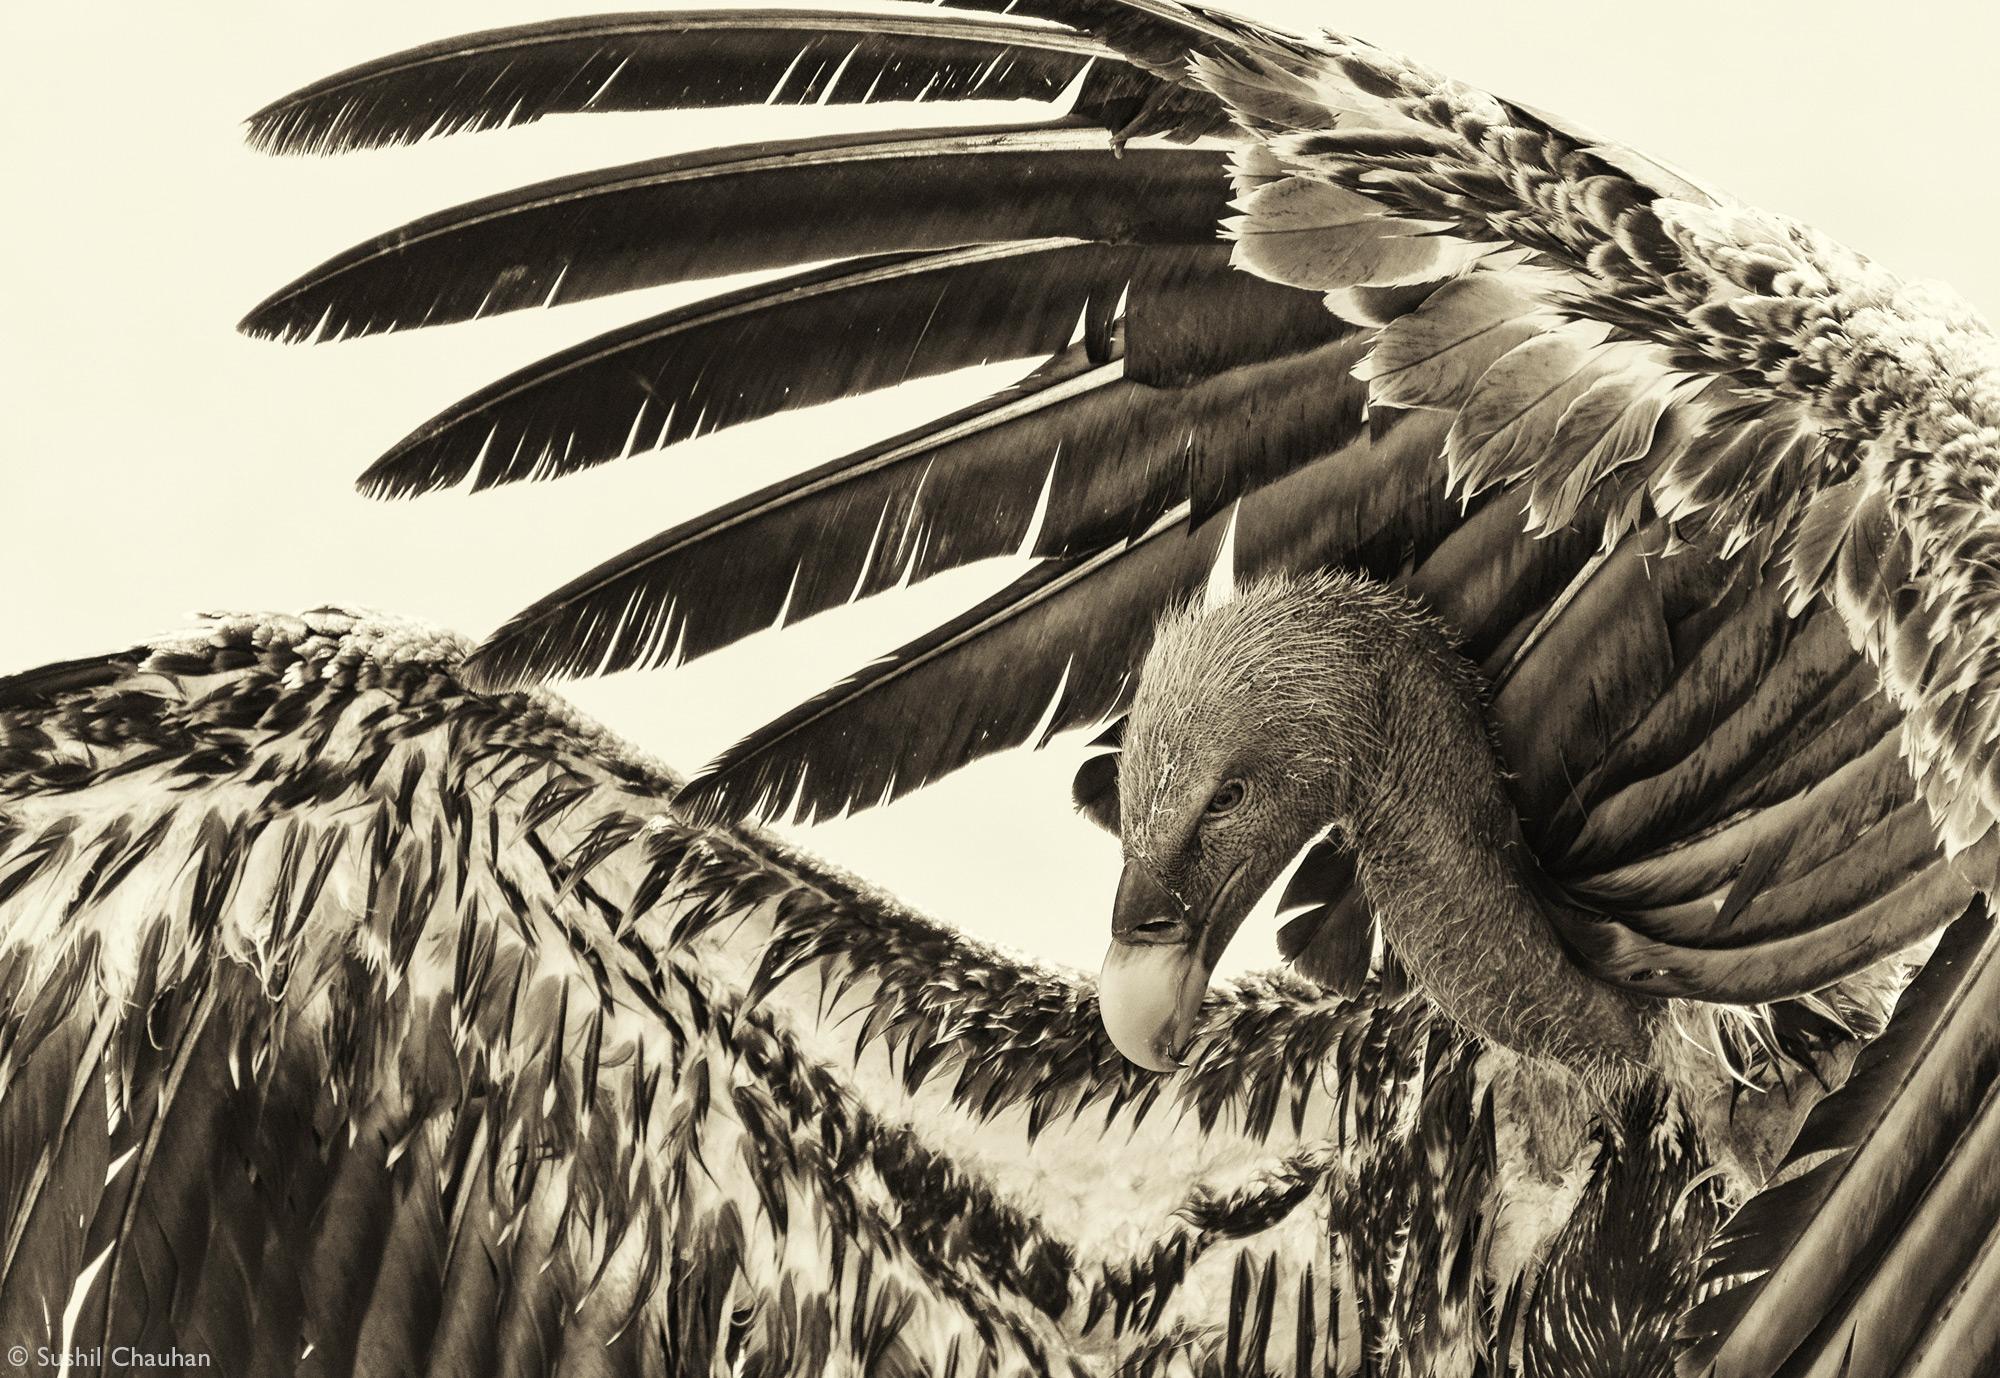 A Rüppell's vulture in Maasai Mara National Reserve, Kenya